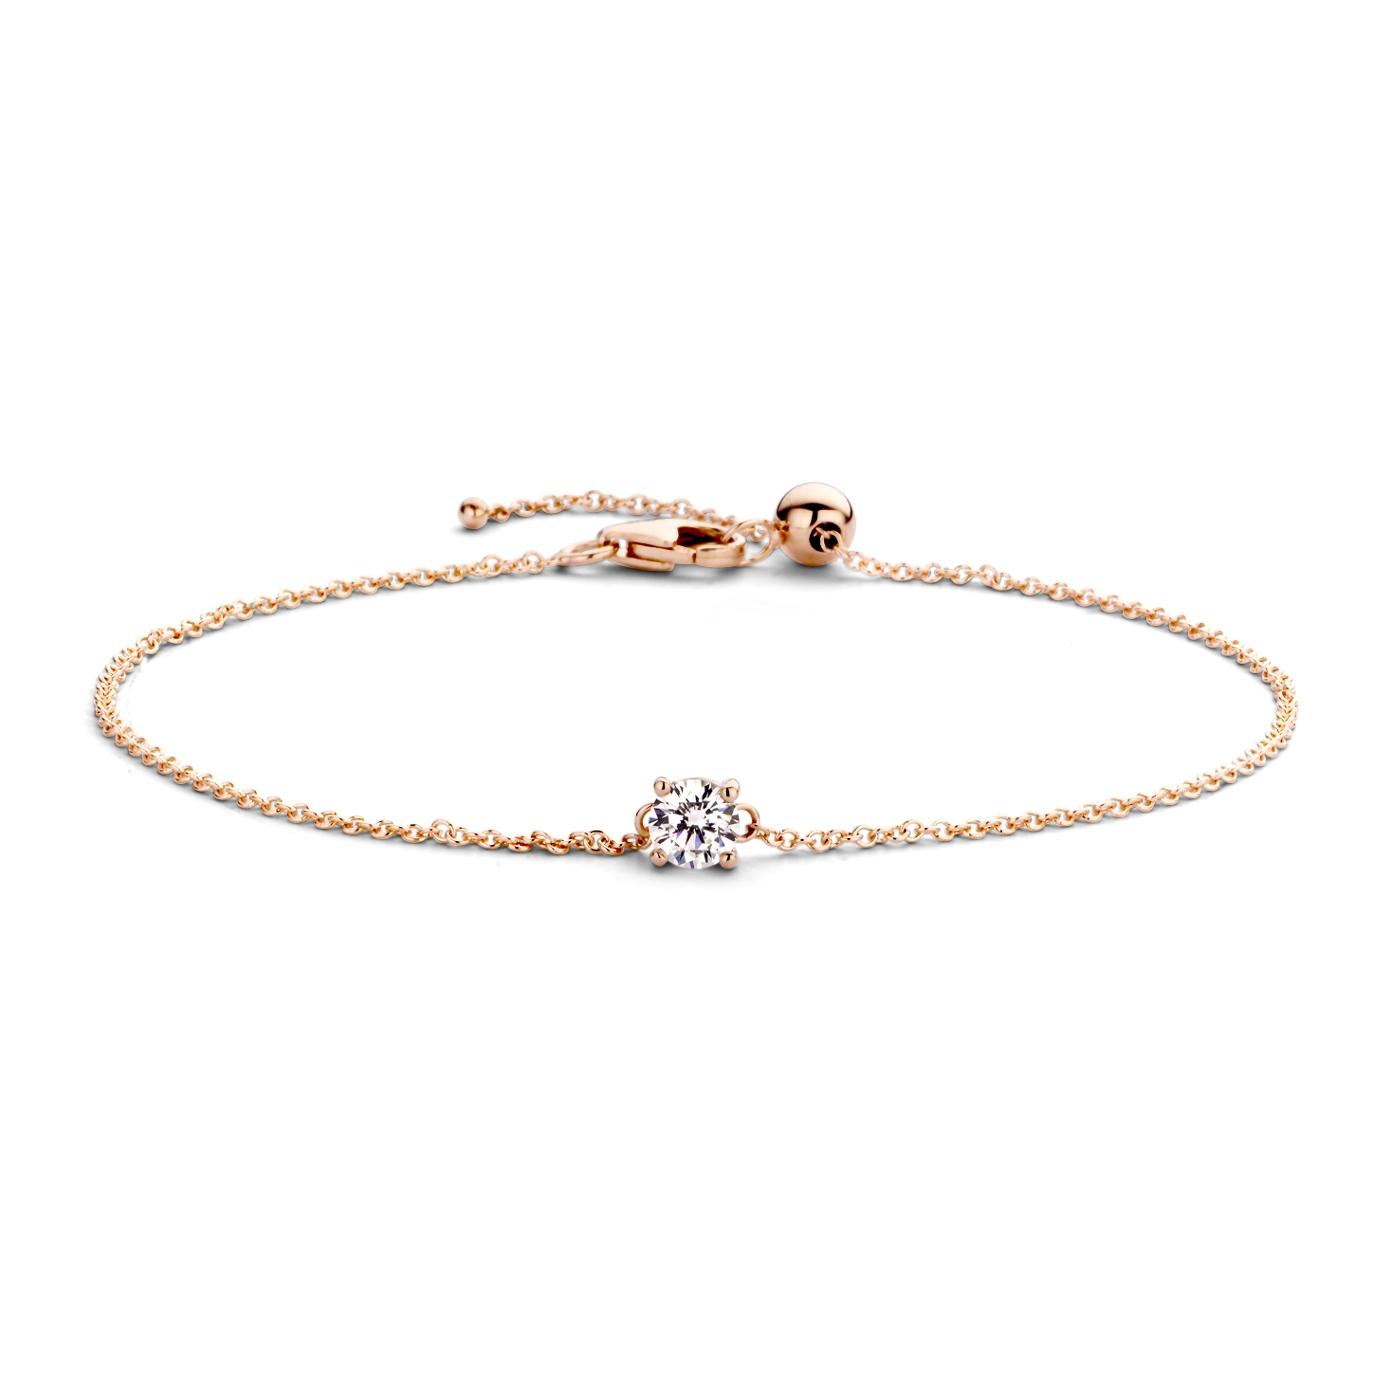 Afbeelding van Blush 14 Karaat Gouden Armband 2166RZI (Lengte: 18.00 cm)